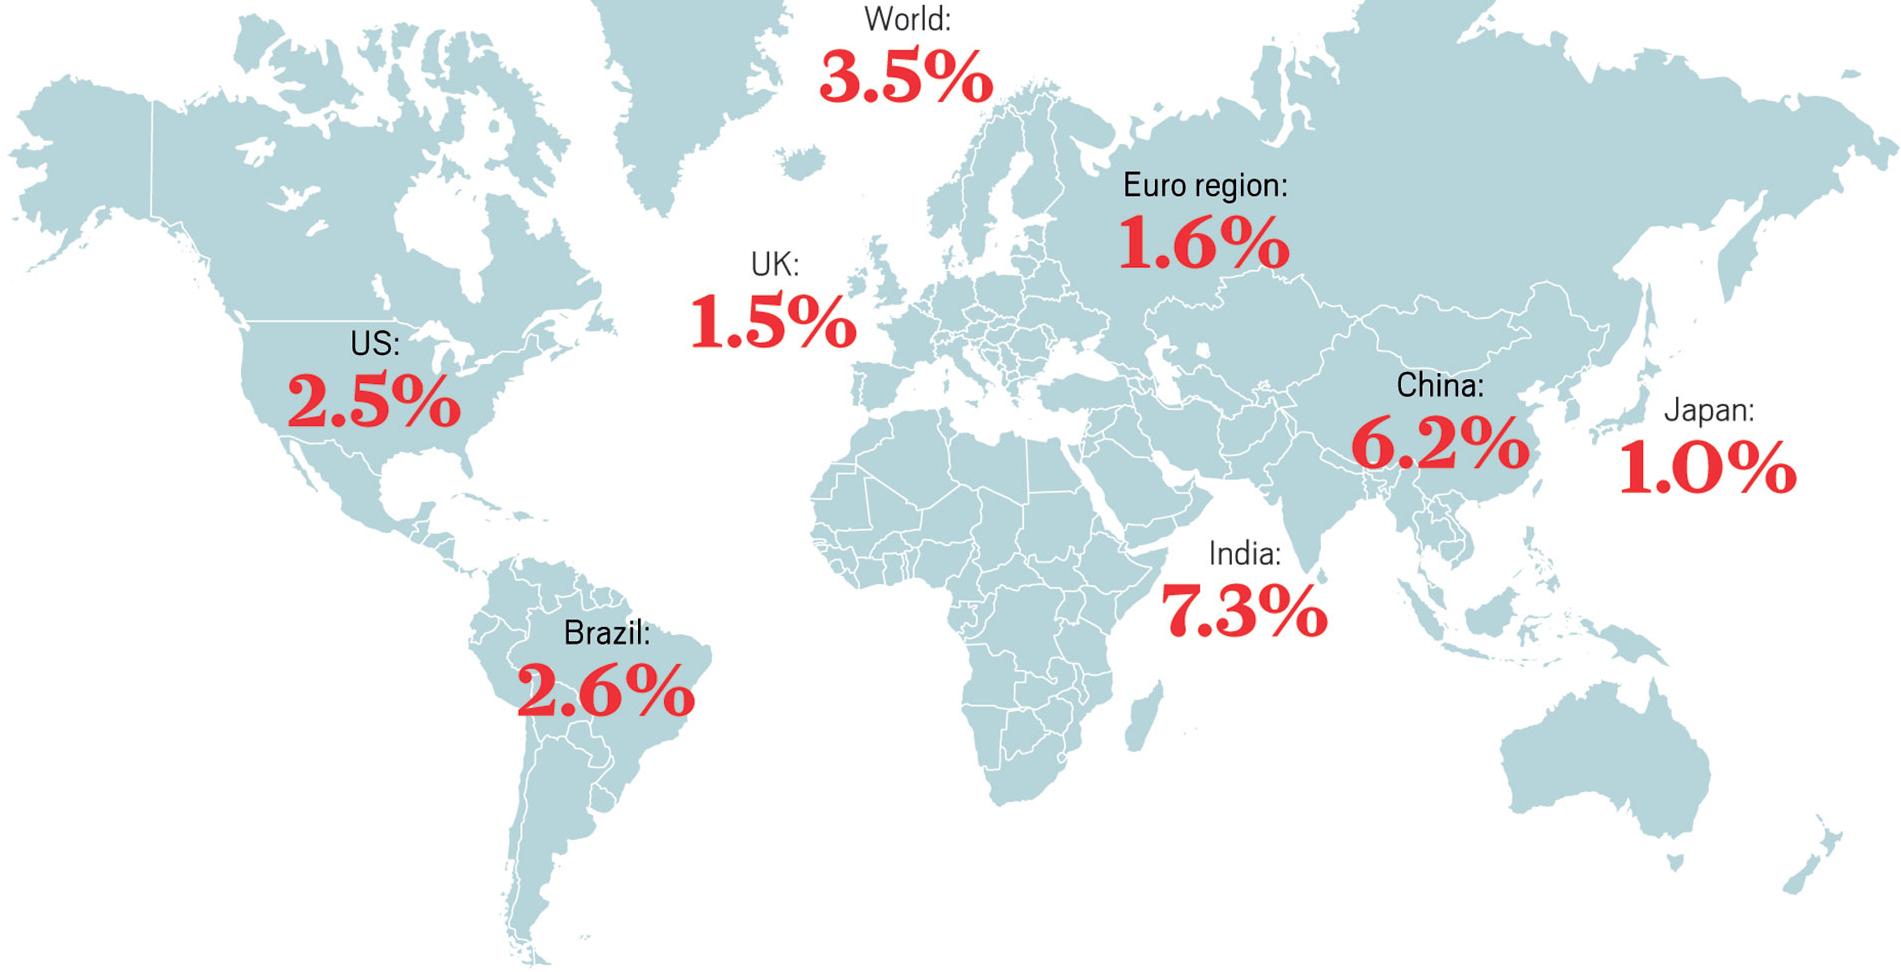 World Chemical Outlook 2019: Major Markets